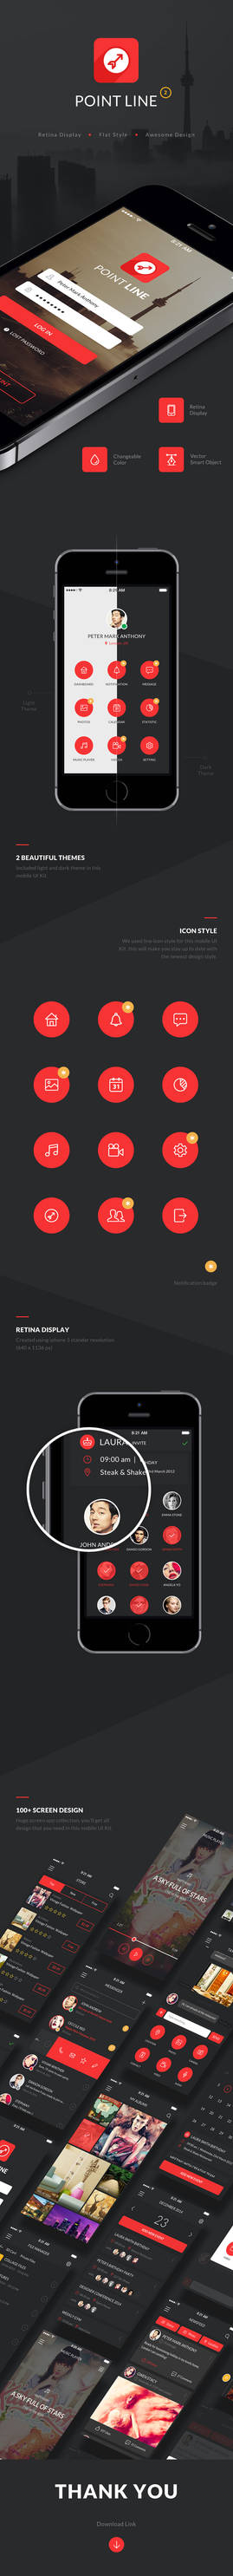 Point Flat Mobile App UI Kit